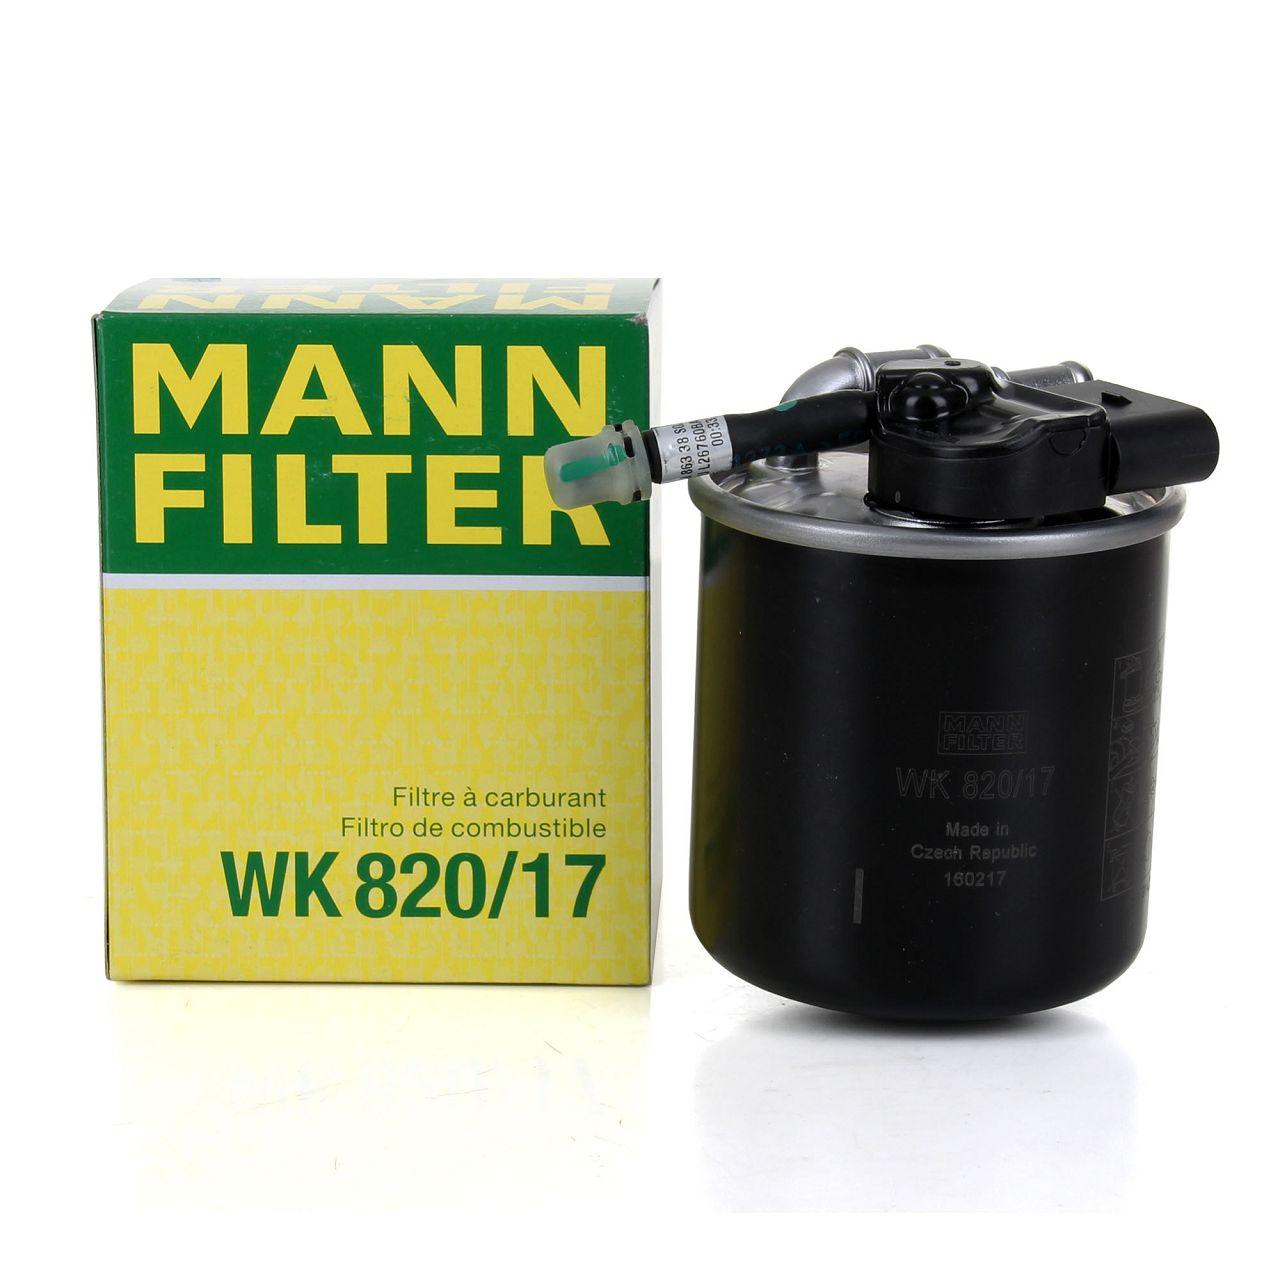 MANN WK820/17 Kraftstofffilter Diesel MERCEDES W204 W205 W212 W221 W222 OM651